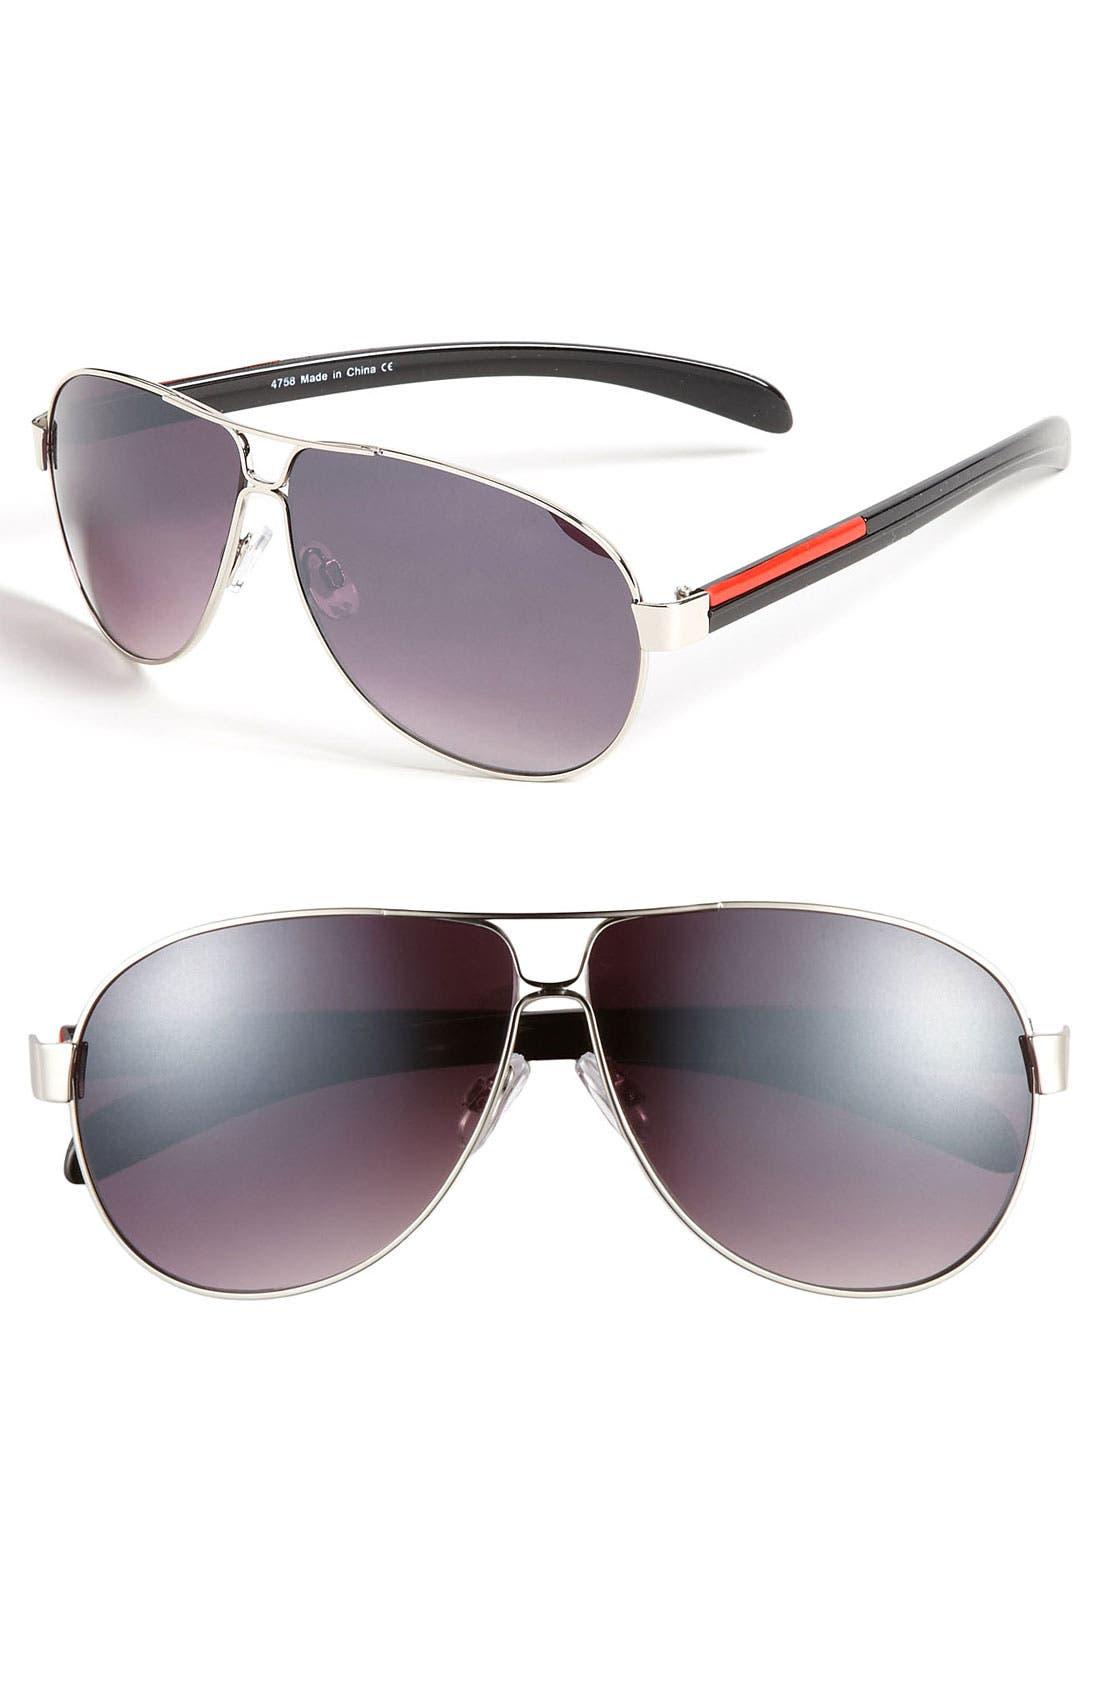 Alternate Image 1 Selected - KW 'Explorer' Aviator Sunglasses